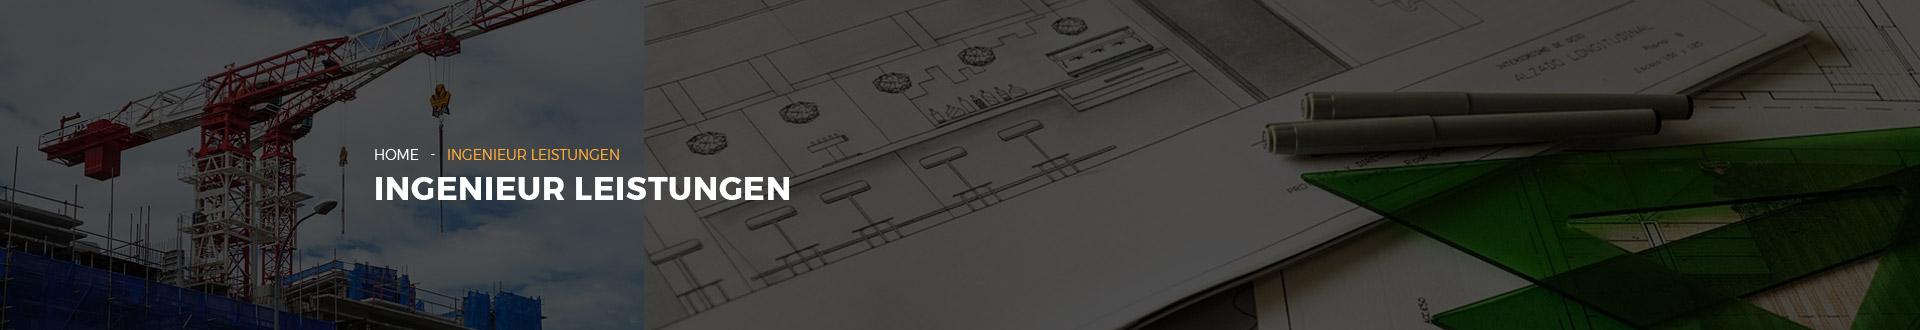 http://arslan-engineering.de/wp-content/uploads/2017/05/header-leistungen-ingenieur-1.jpg